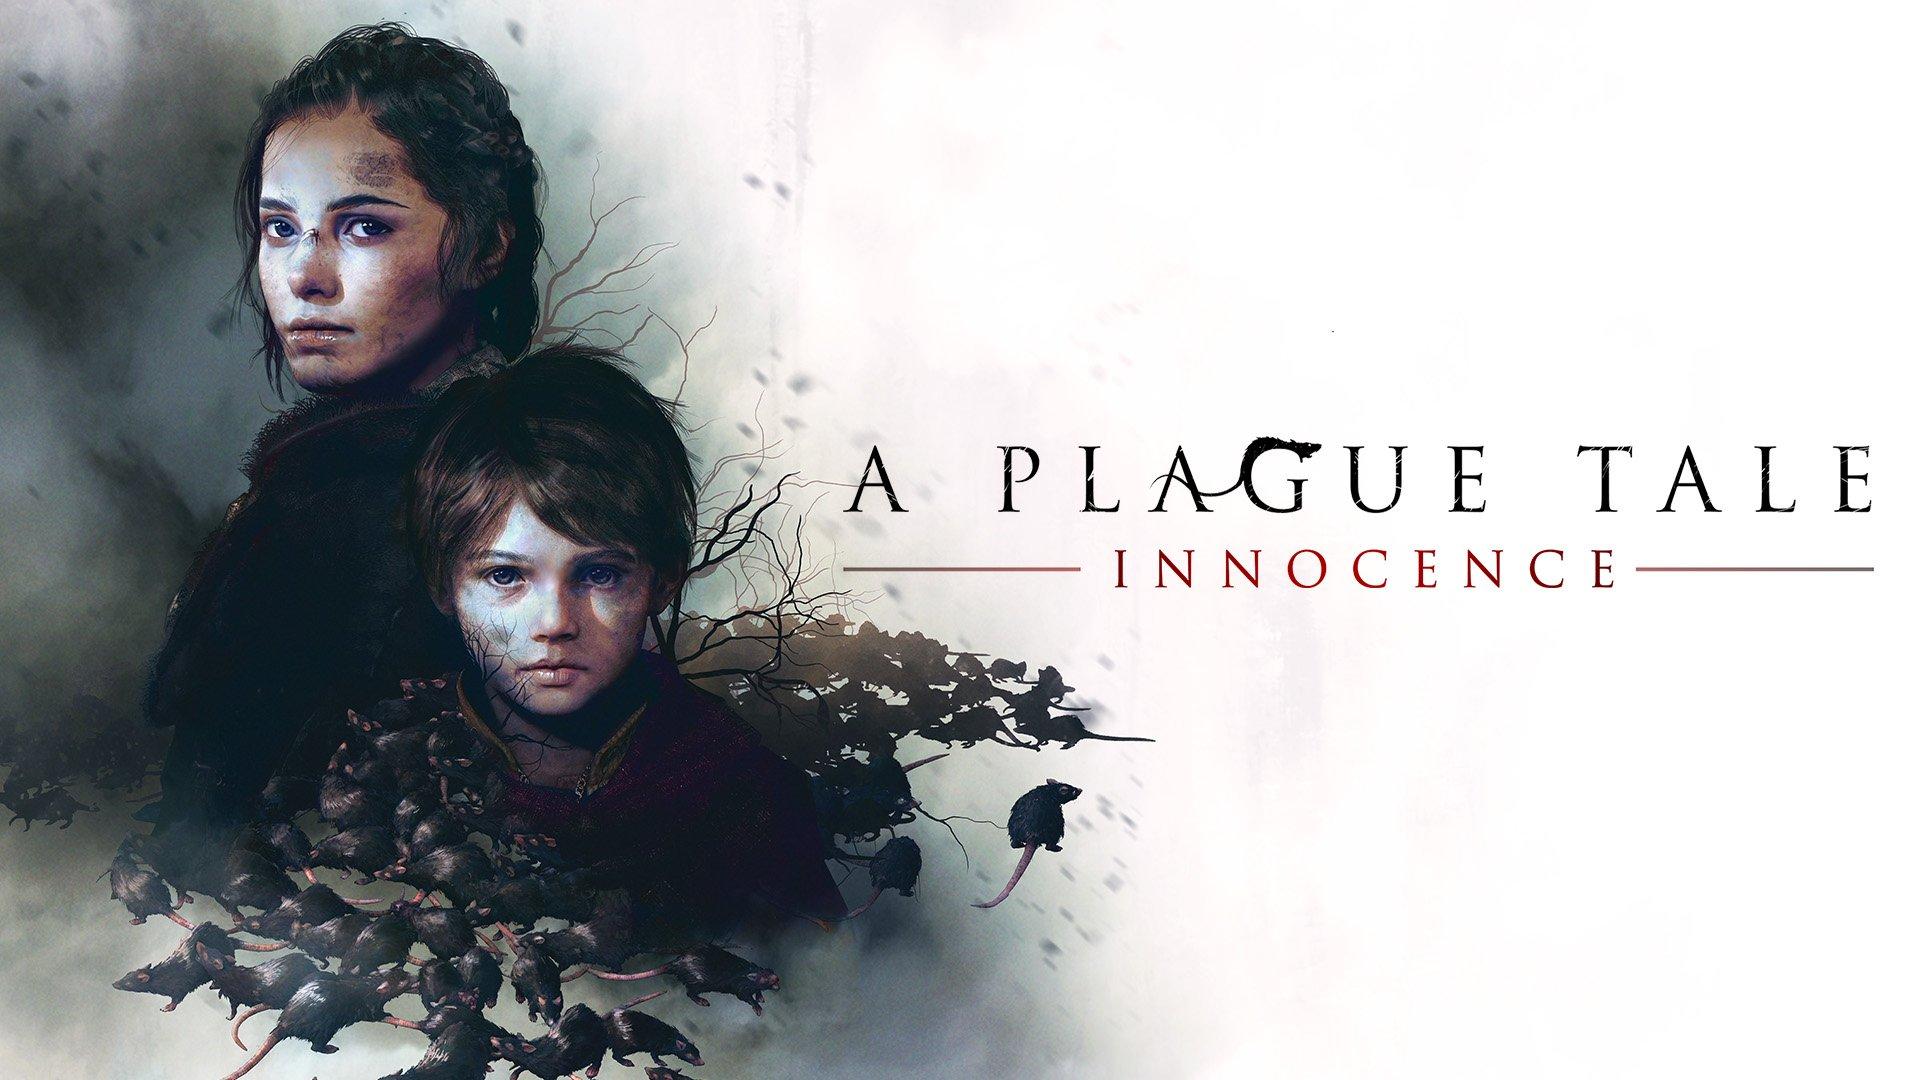 a-plague-tale-innocence-seitch-nintendon